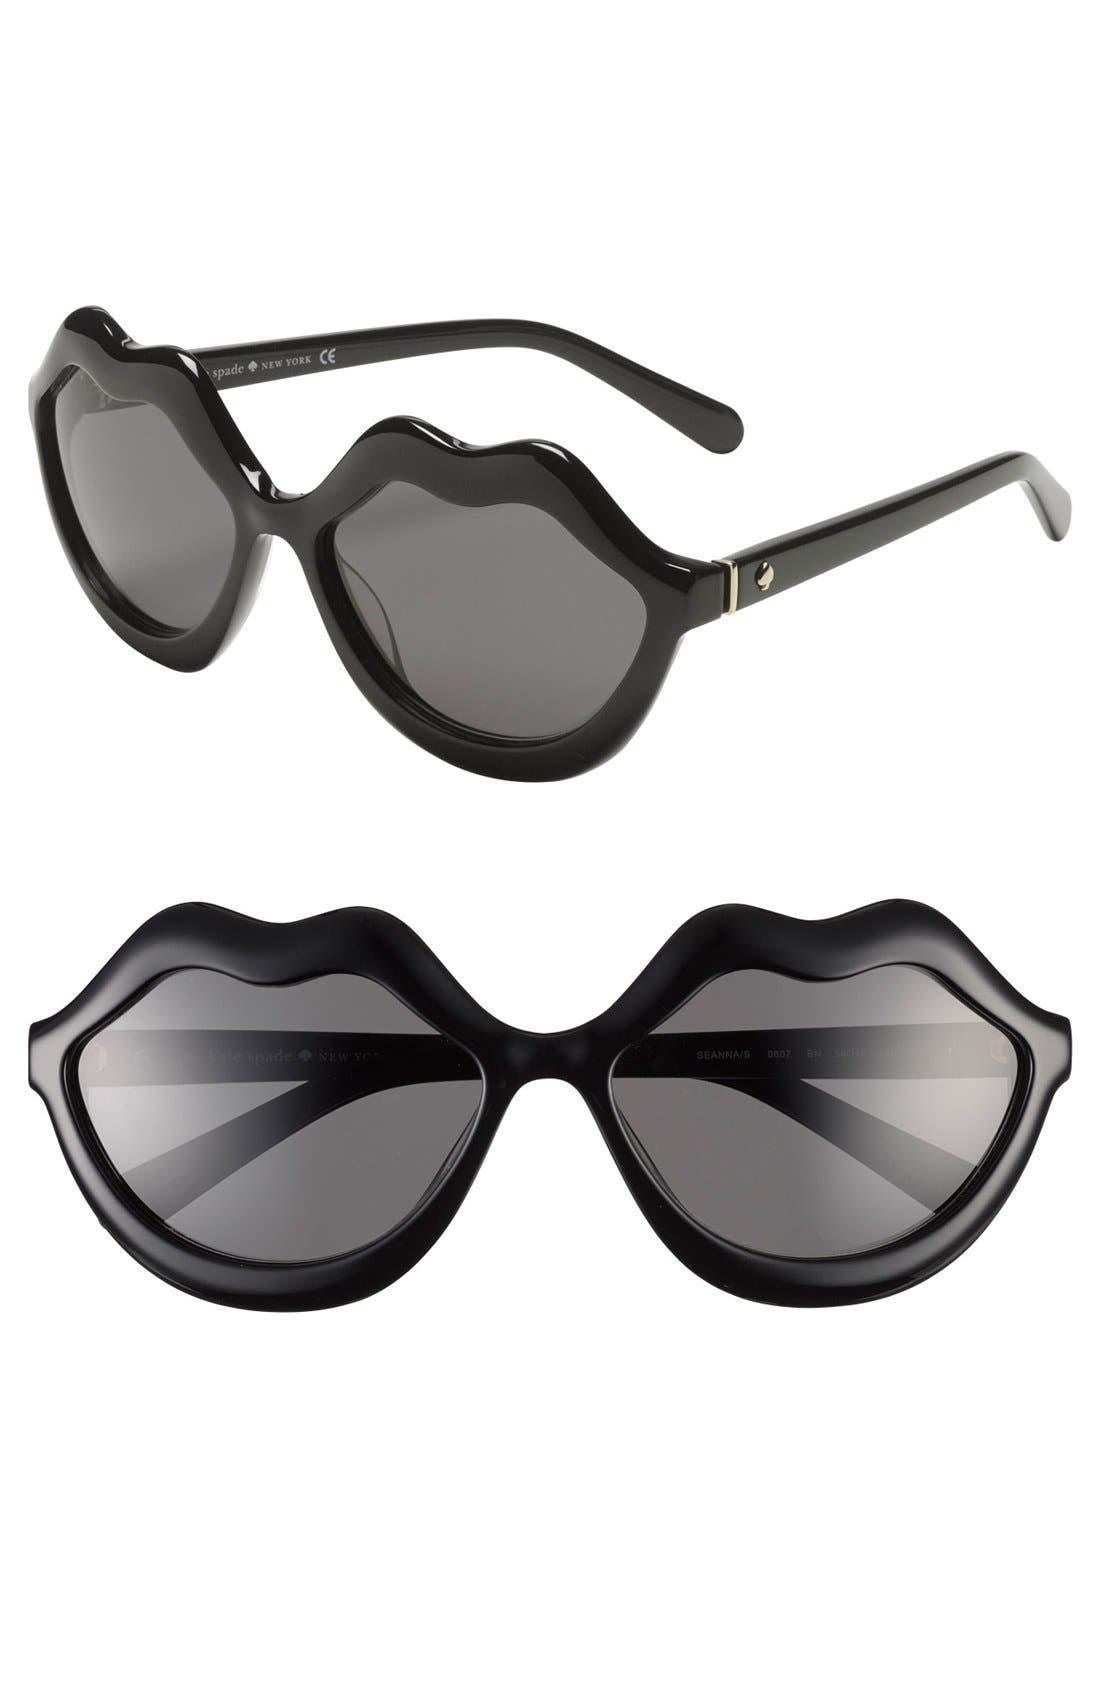 Alternate Image 1 Selected - kate spade new york 'seanns' 59mm sunglasses